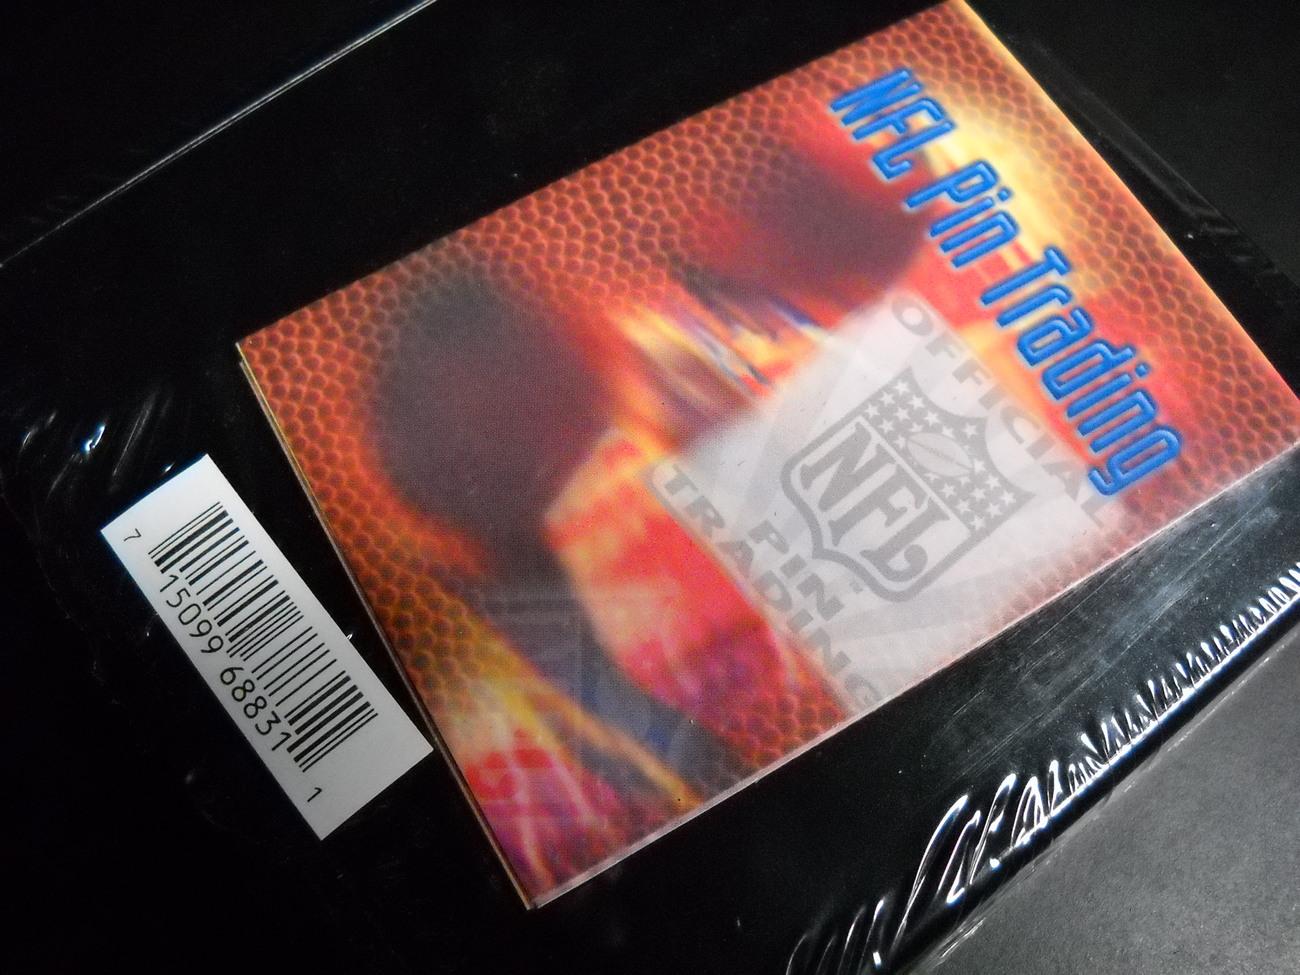 NFL Football Super Bowl XXXVII Commemorative Pin Set Original Transparent Case